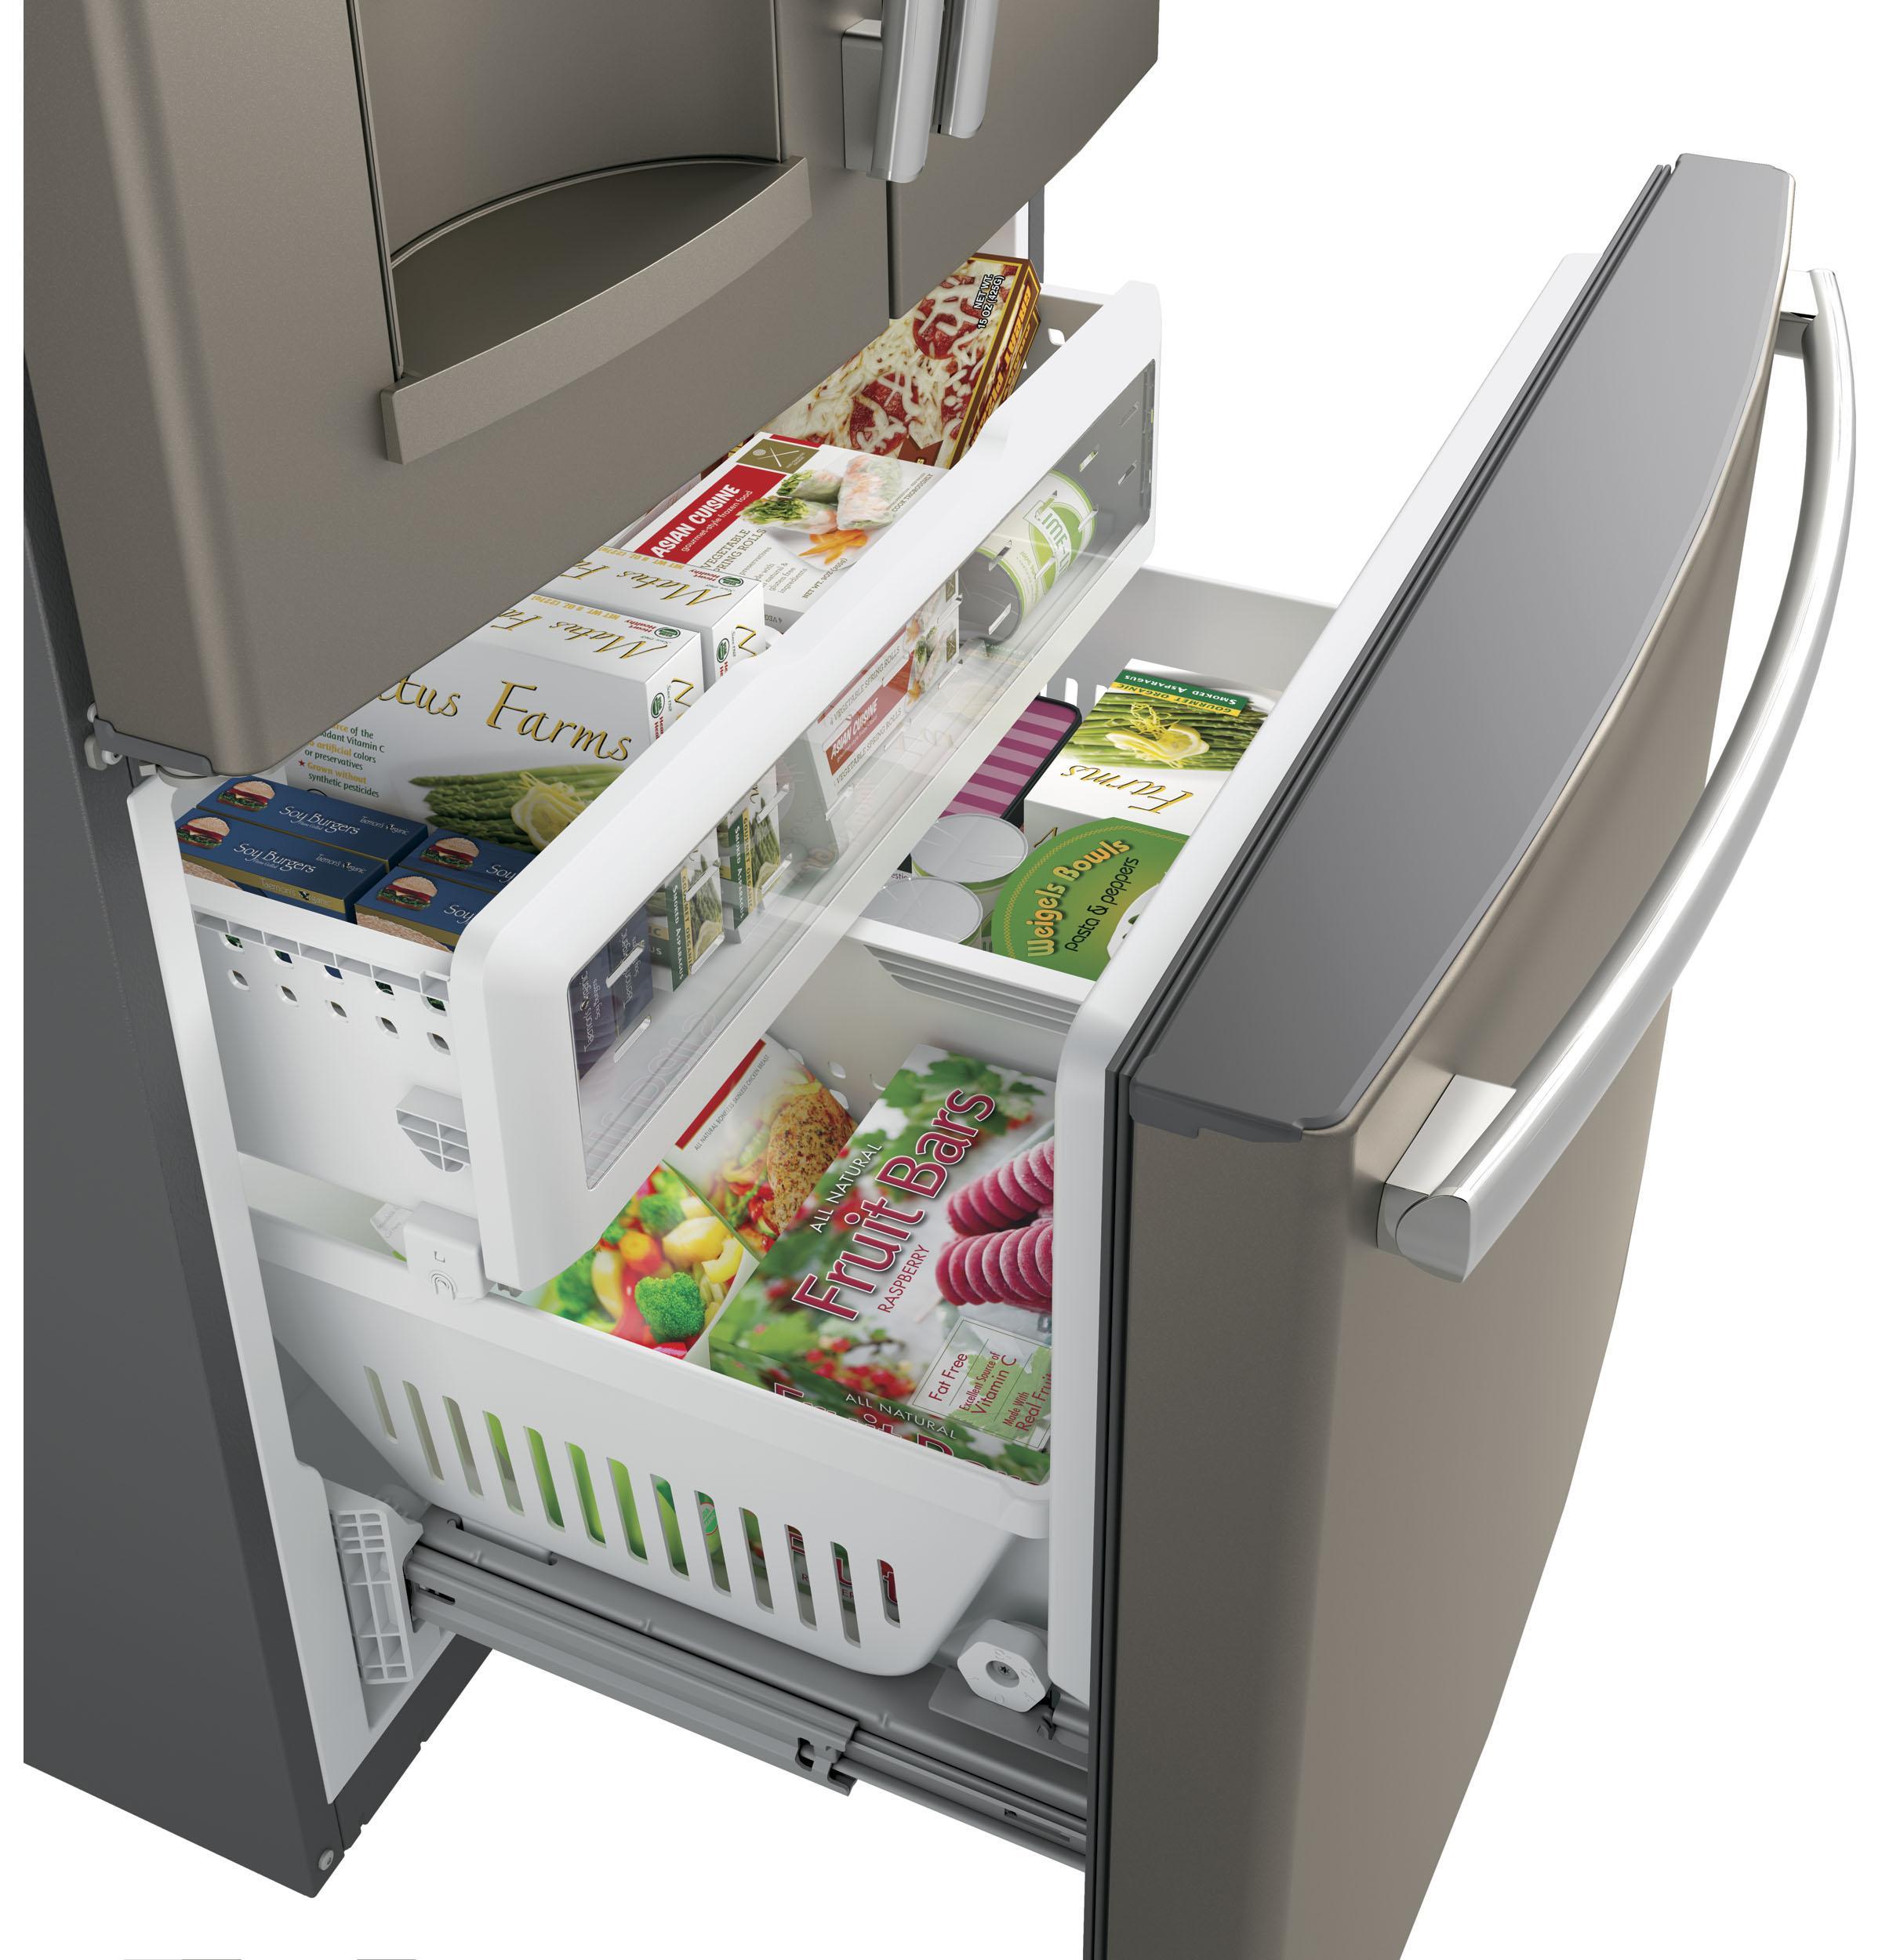 Gfs26gmnesge 174 25 8 Cu Ft French Door Refrigerator Slate